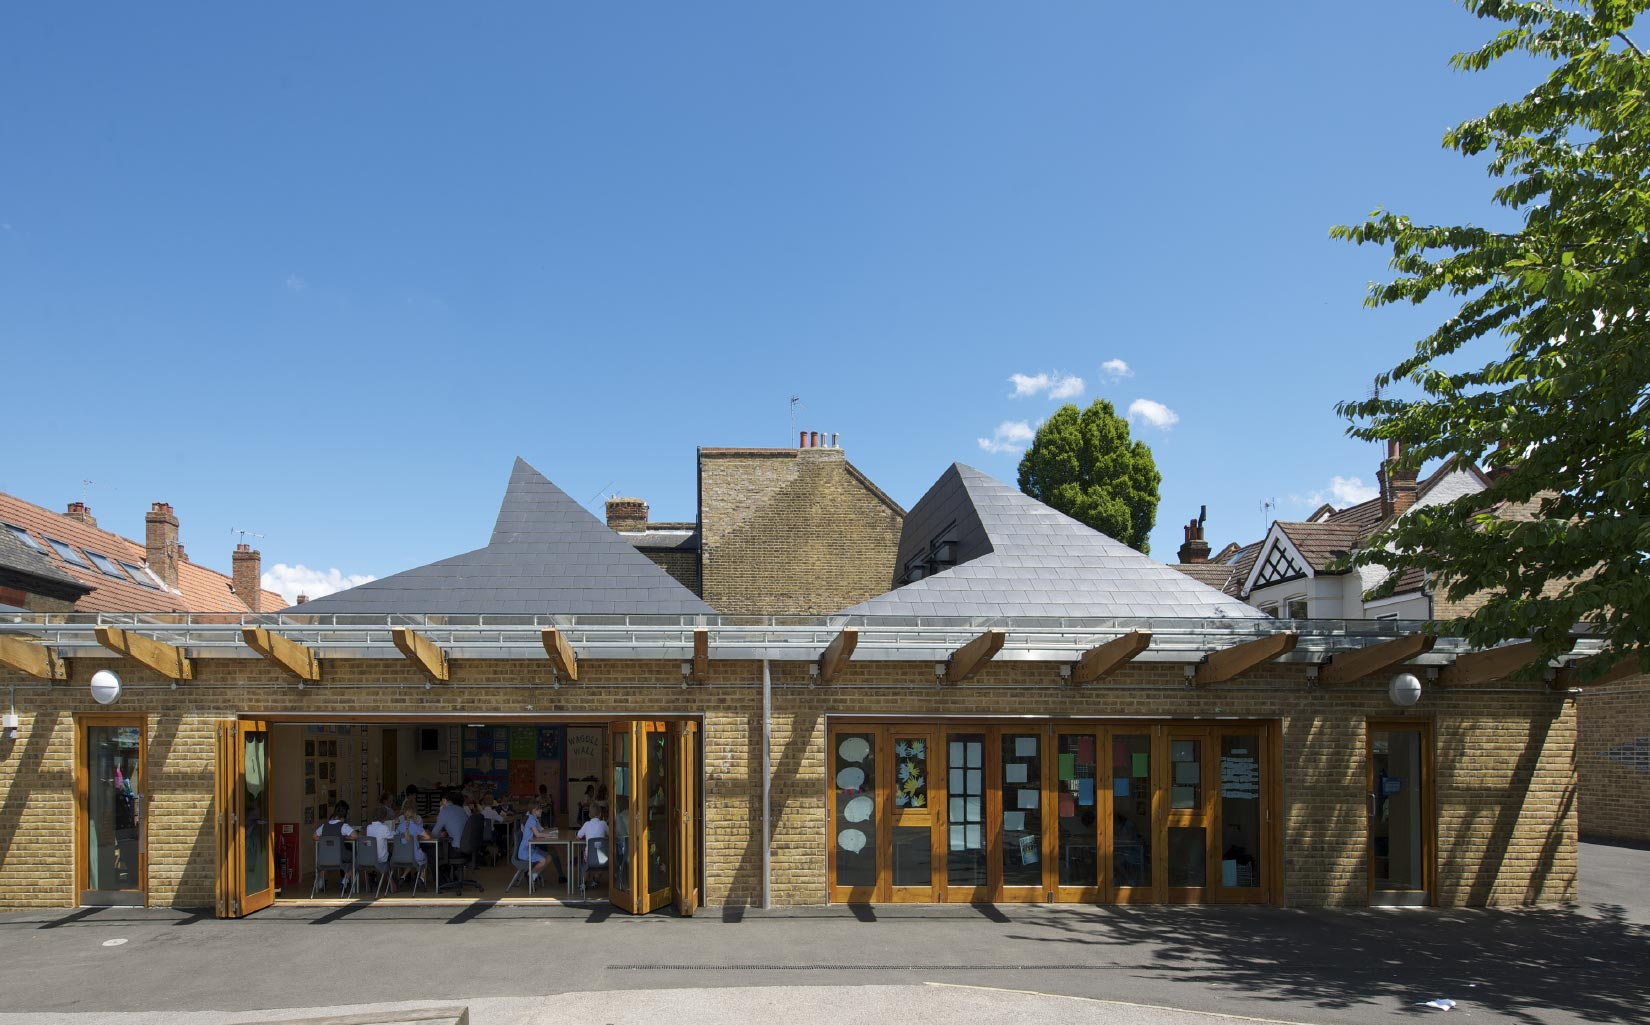 Orleans School, Twickenham, London, Elevation View